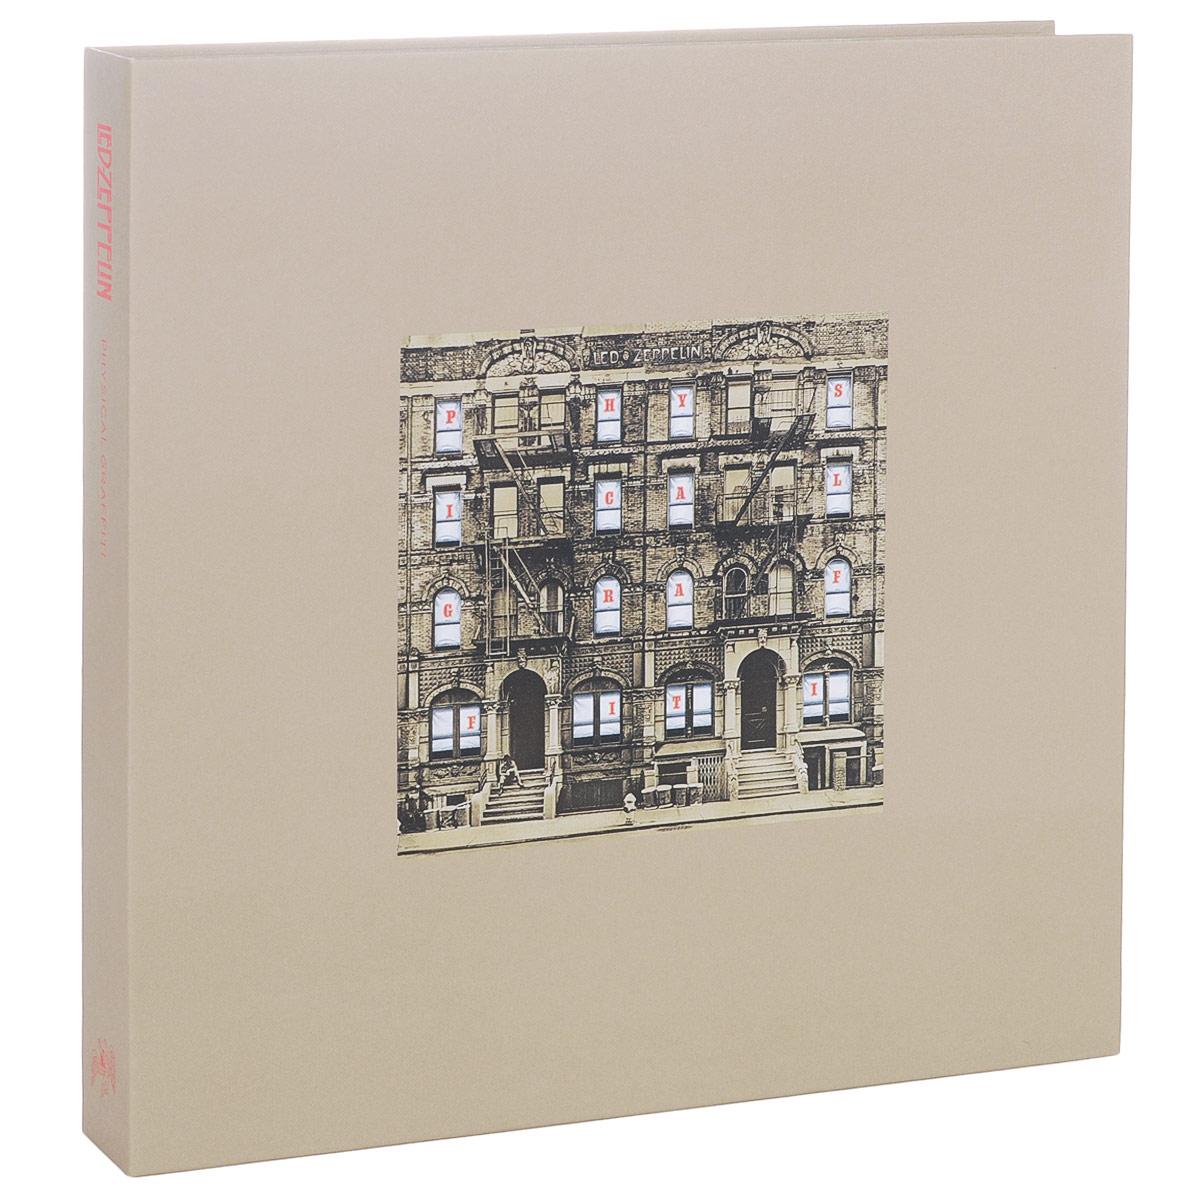 Led Zeppelin. Physical Graffiti. Super Deluxe Edition (3 CD + 3 LP)